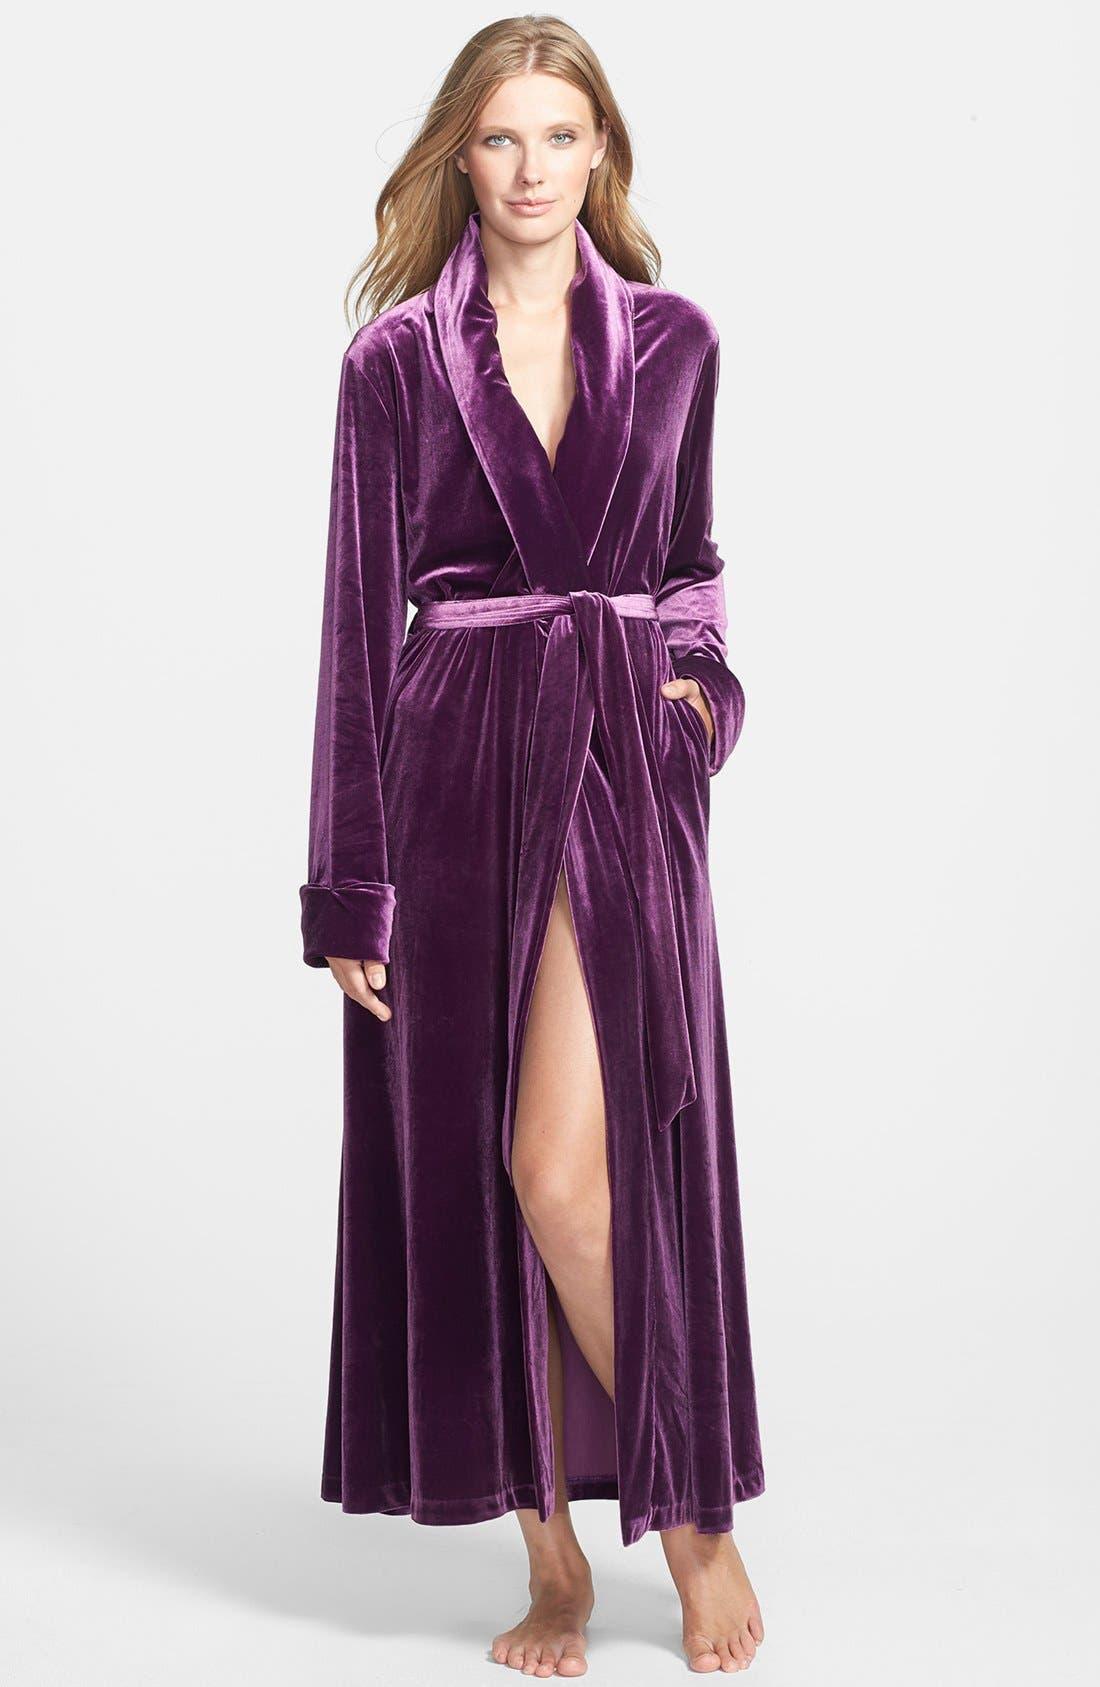 Main Image - Oscar de la Renta Sleepwear 'Zahara Nights' Velvet Robe